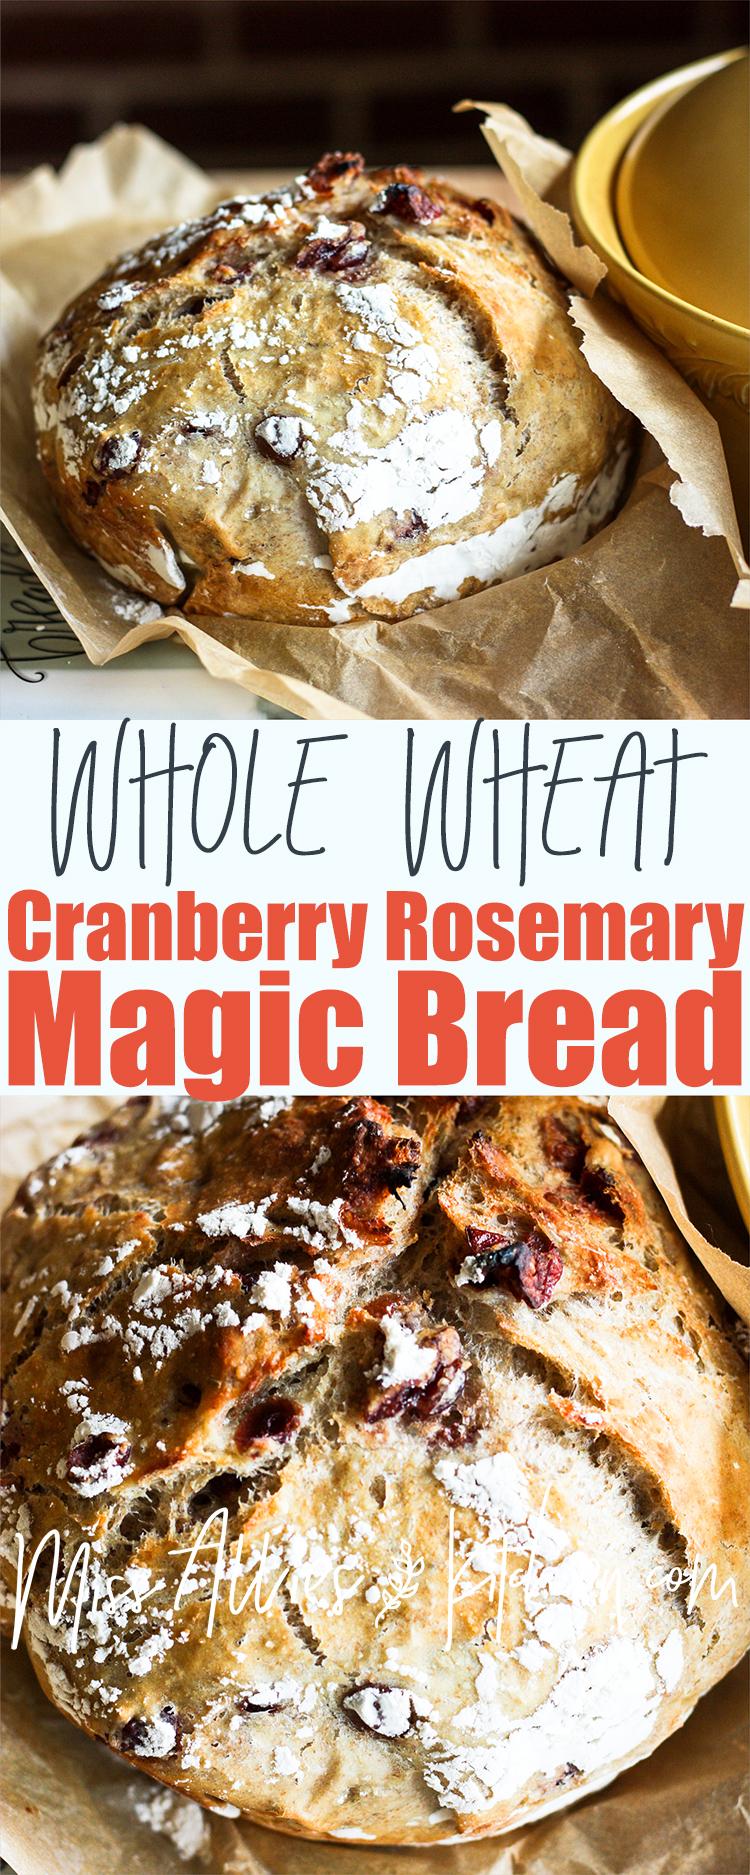 Whole Wheat Cranberry Rosemary Magic Bread